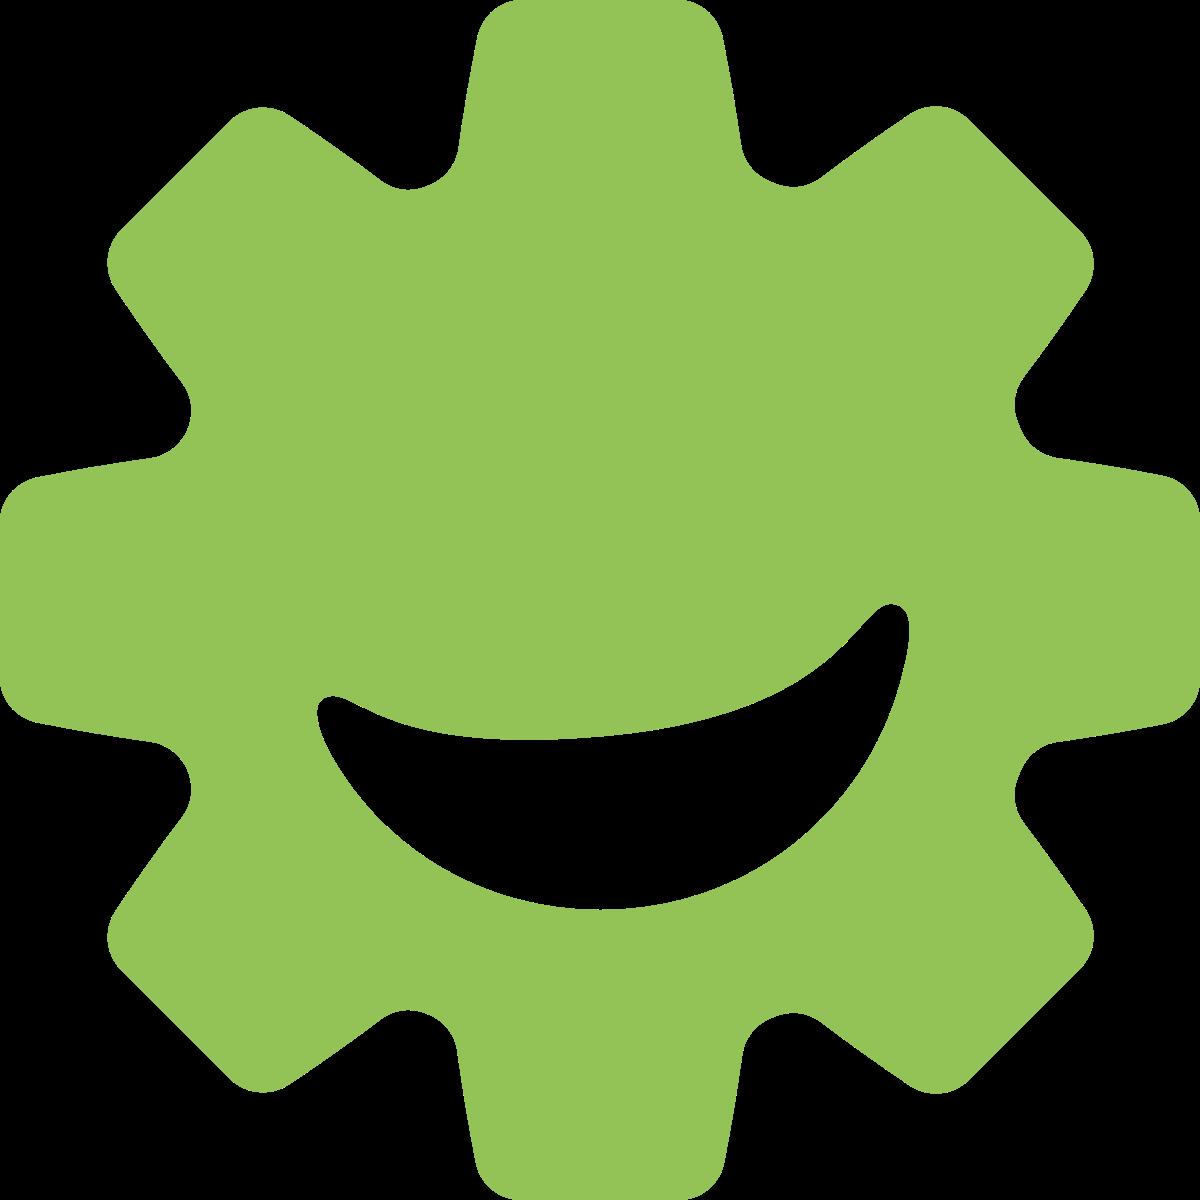 Logo of The Royal Oak - Vixen Group